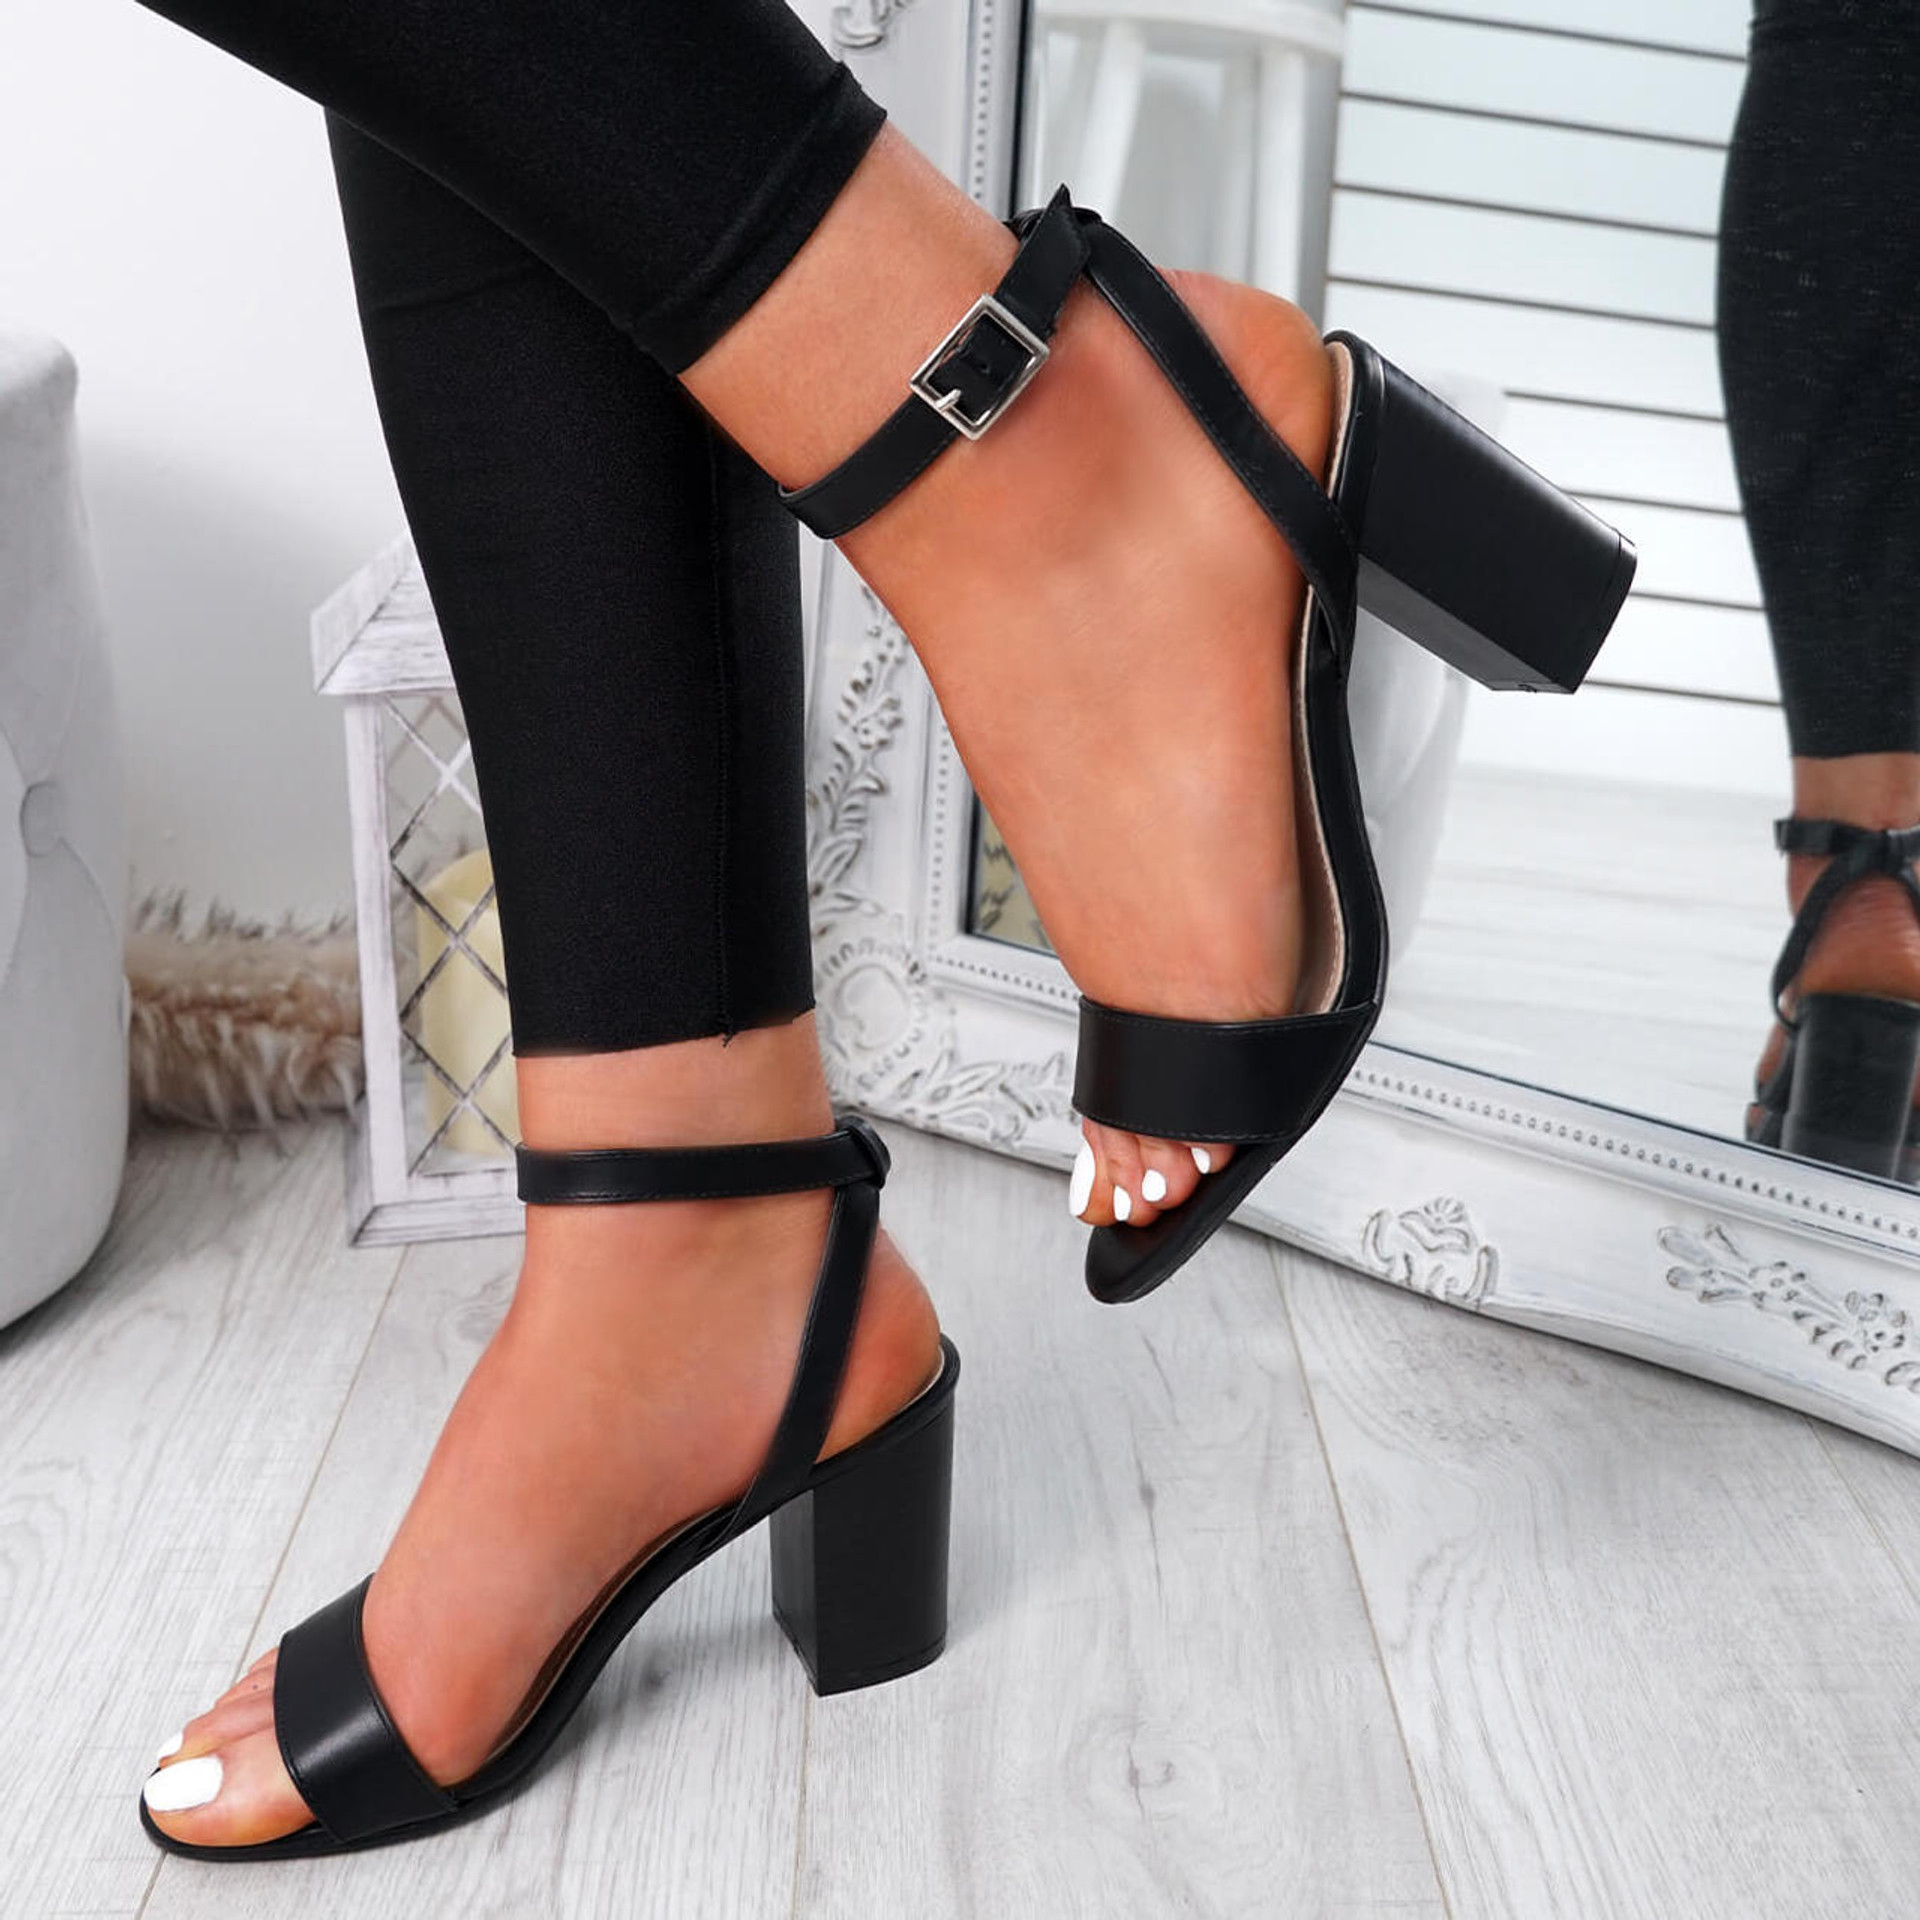 Tewa Black Ankle Strap Sandals